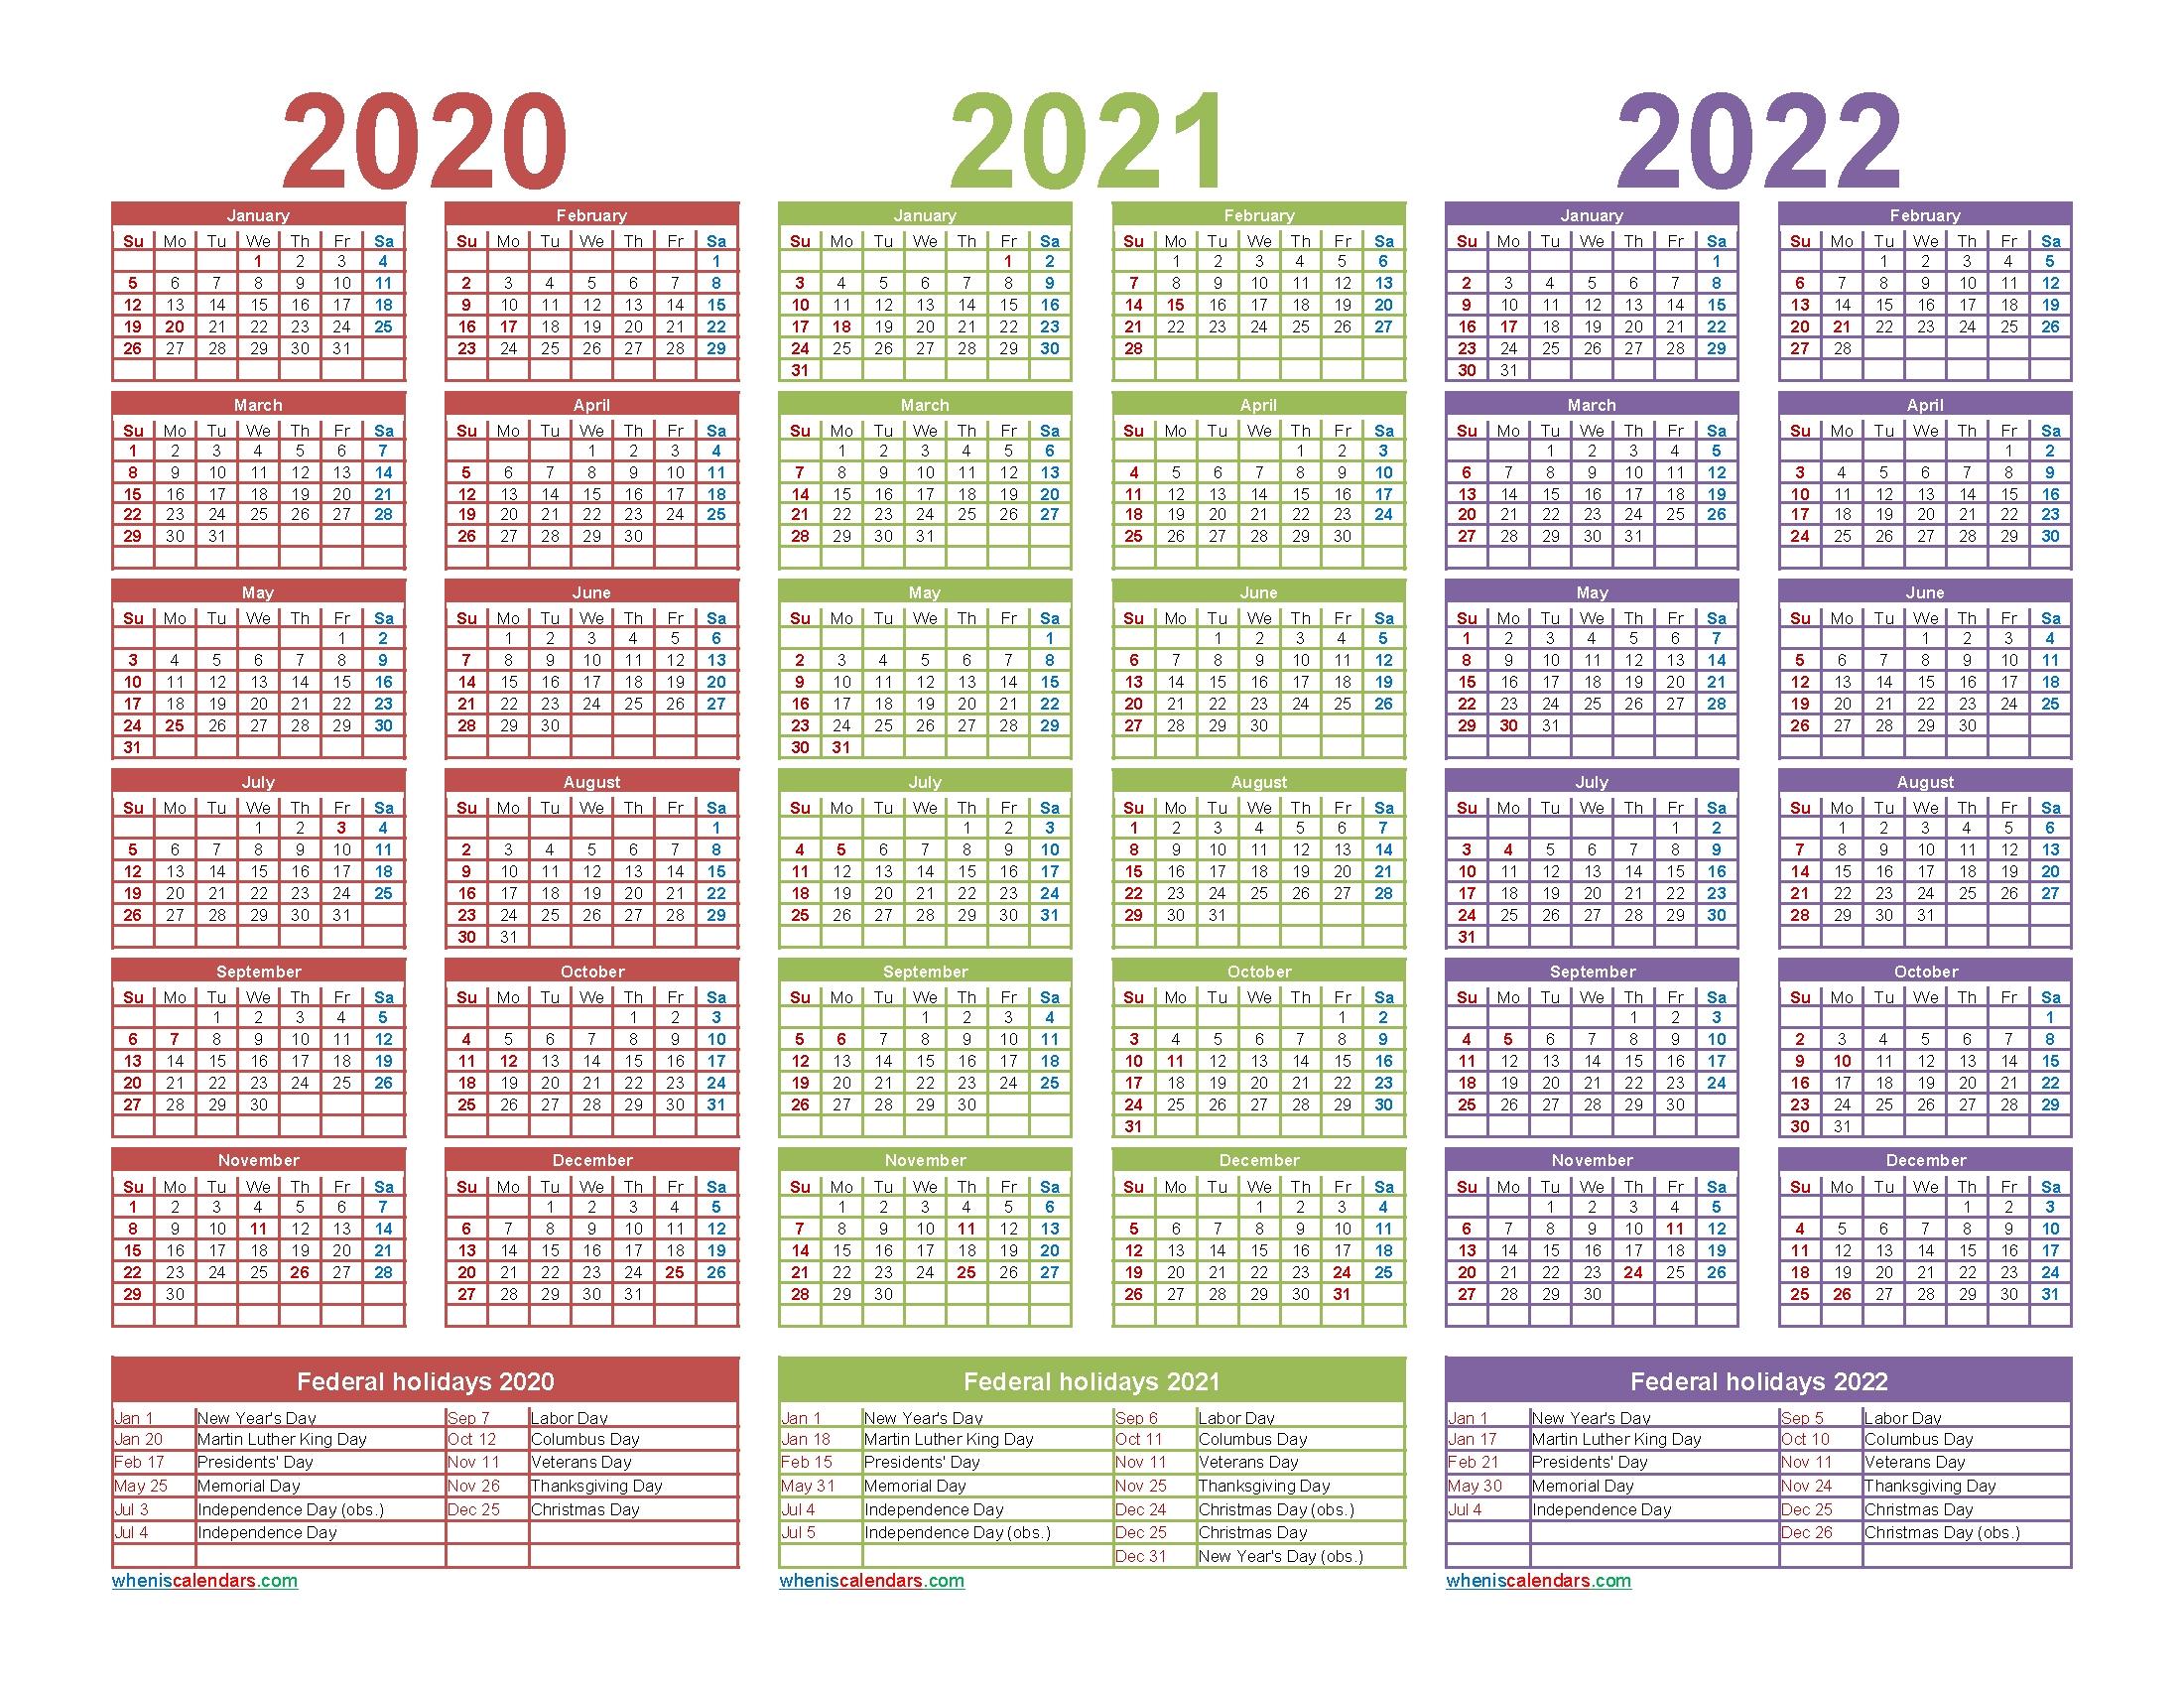 3 Year Calendar 2020 To 2022 Printable | Free Printable 2020 regarding 2020 2021 2022 2023 Calendar Printable One Page